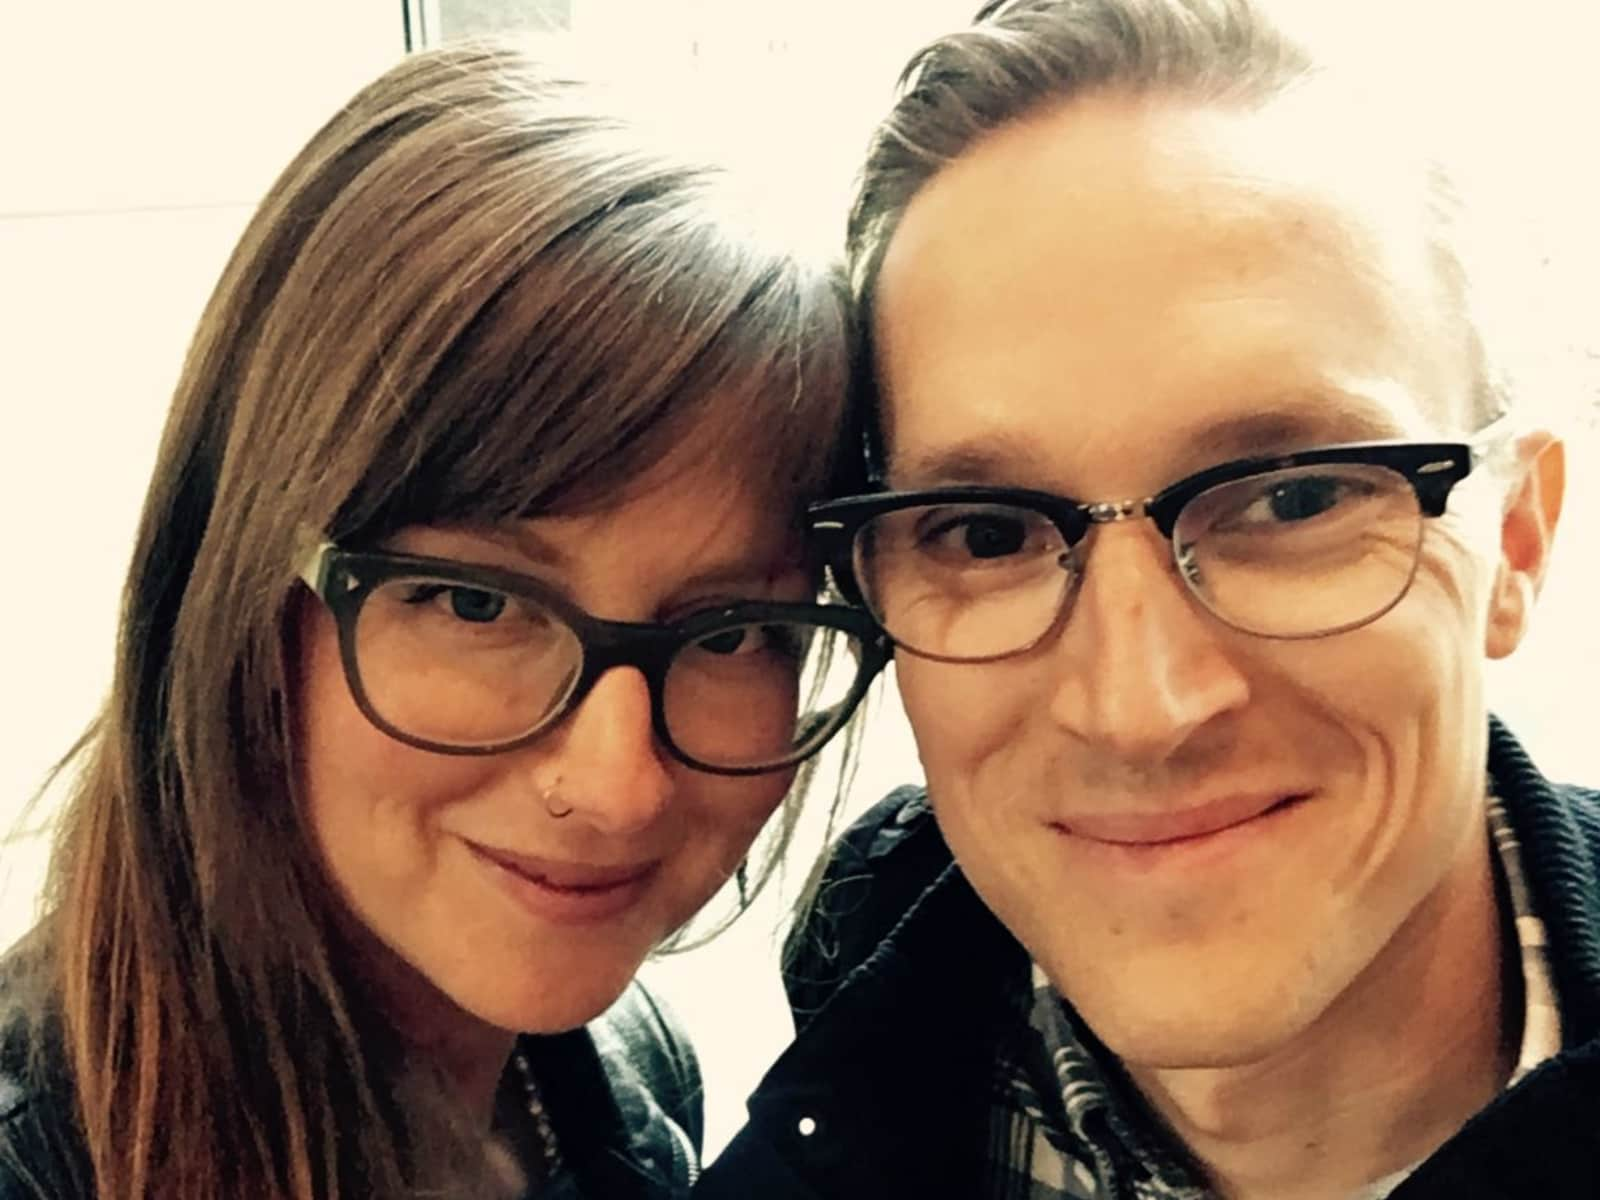 Adrianna & Josh from Vancouver, British Columbia, Canada